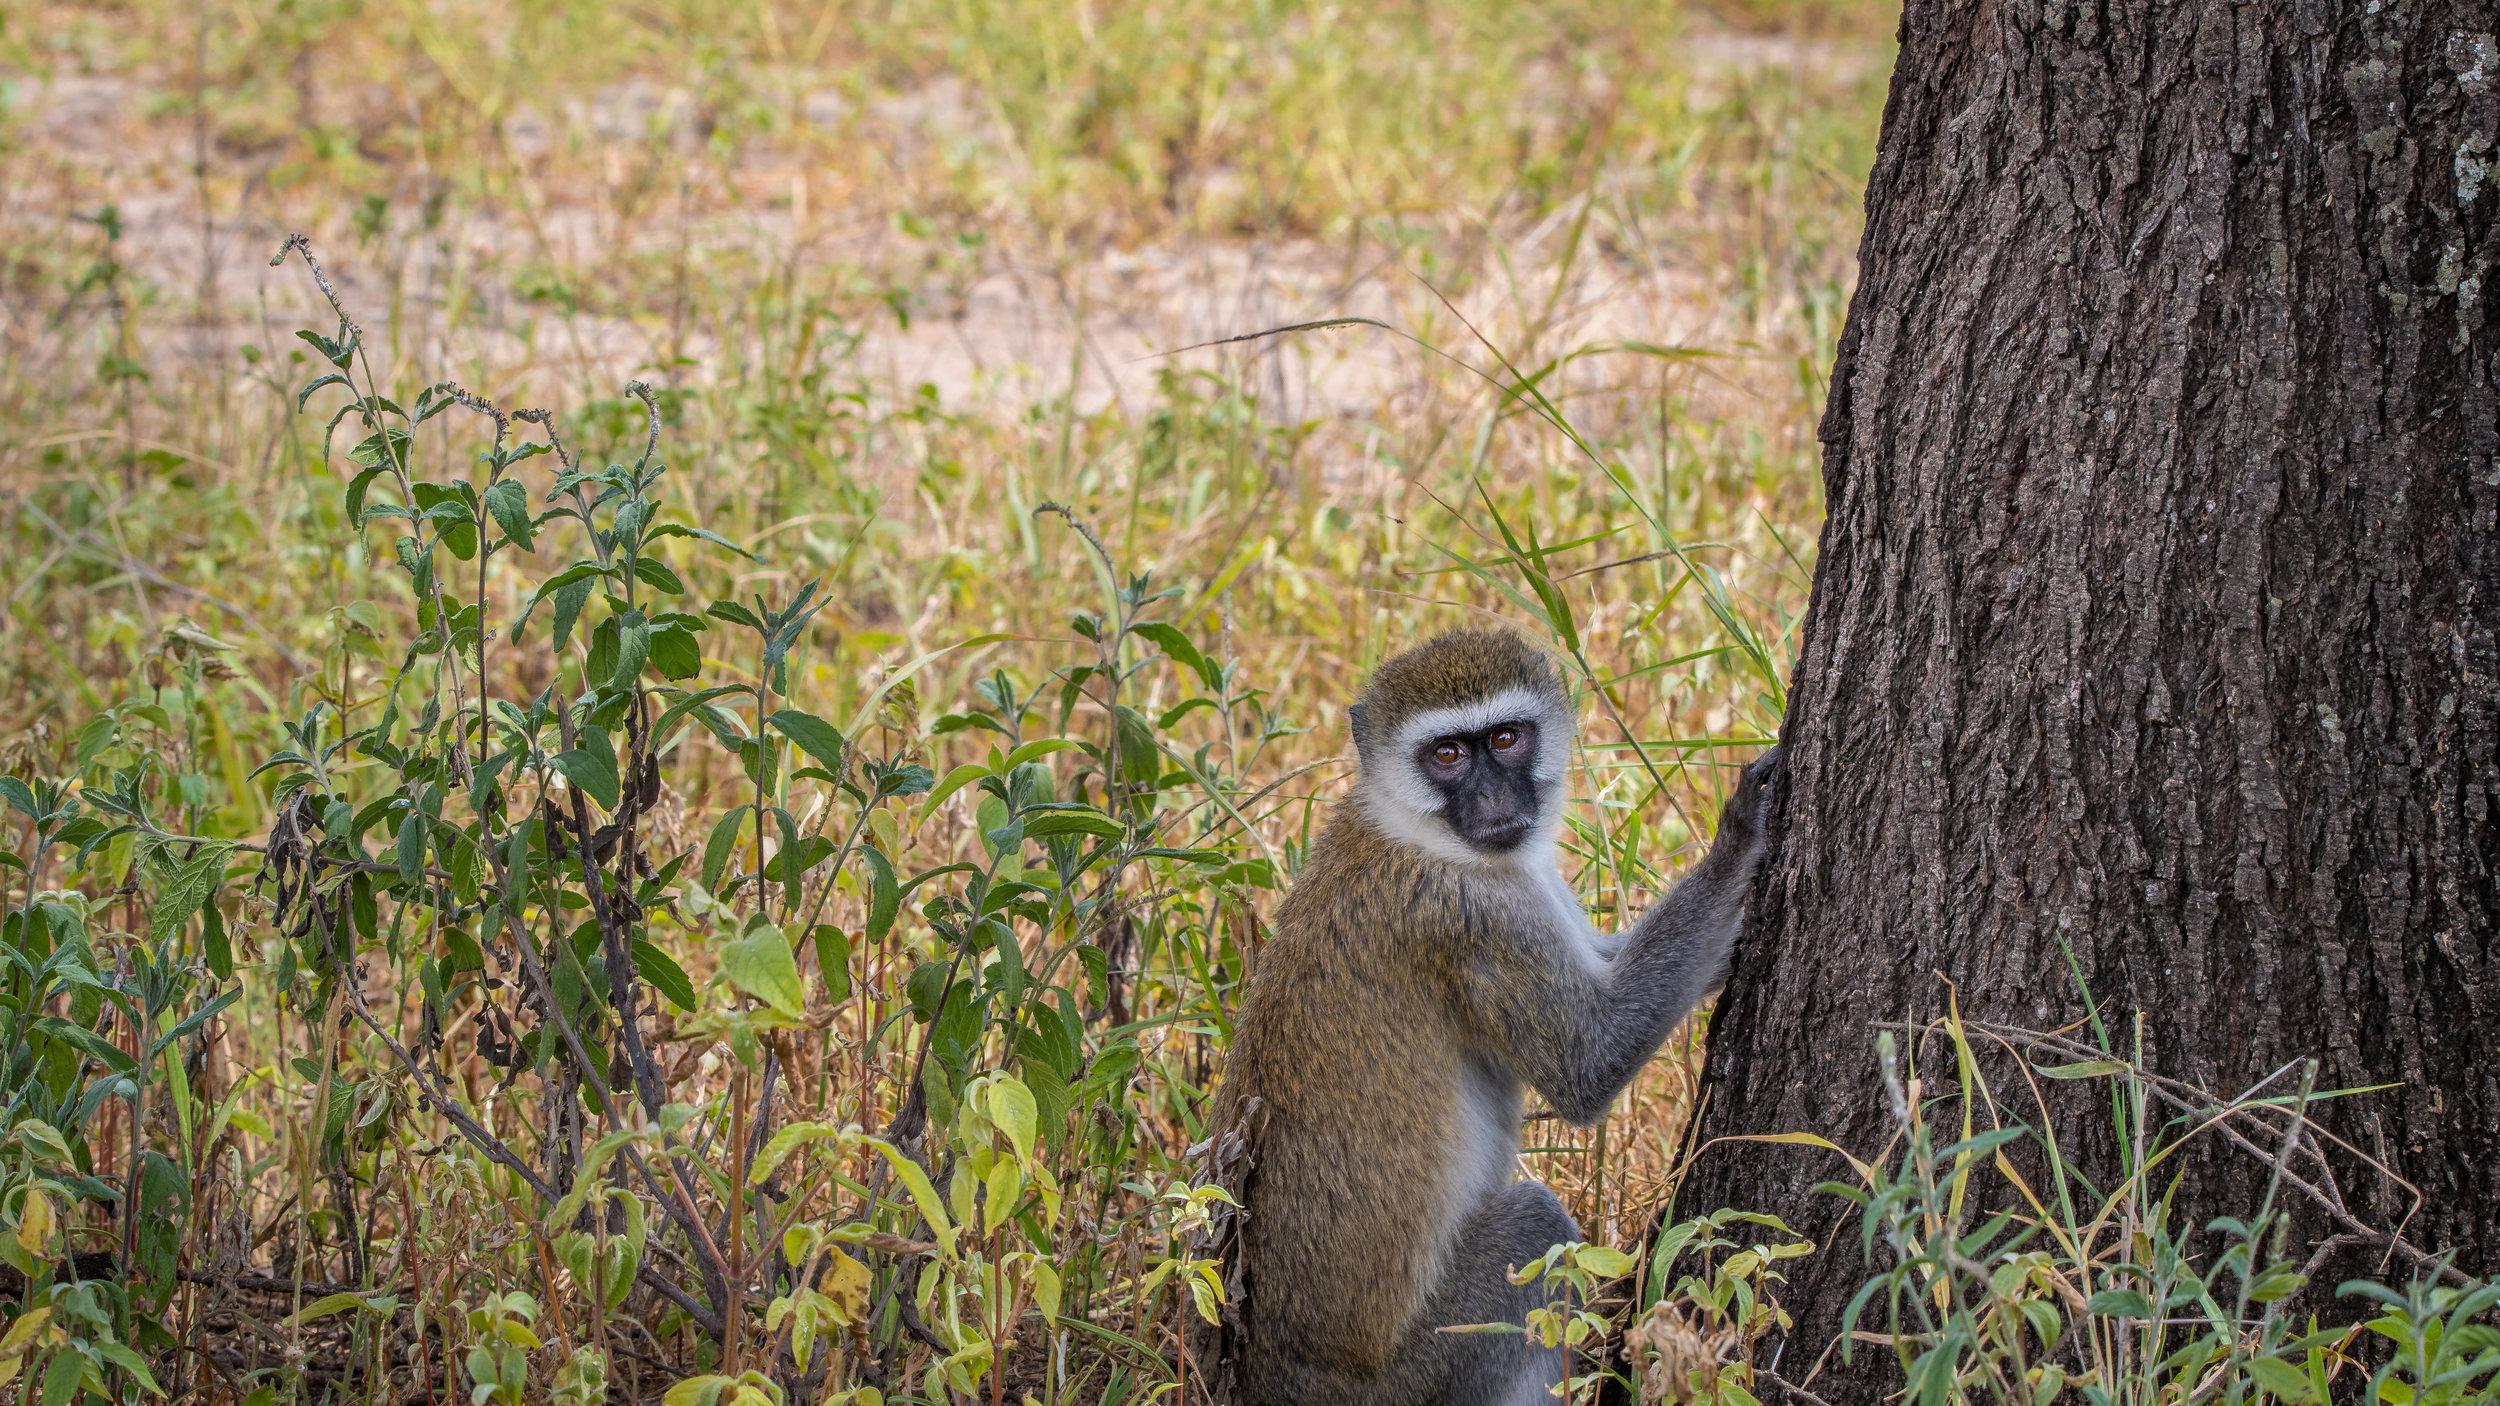 2018-3-6 - 01 Monkey and a tree.jpg